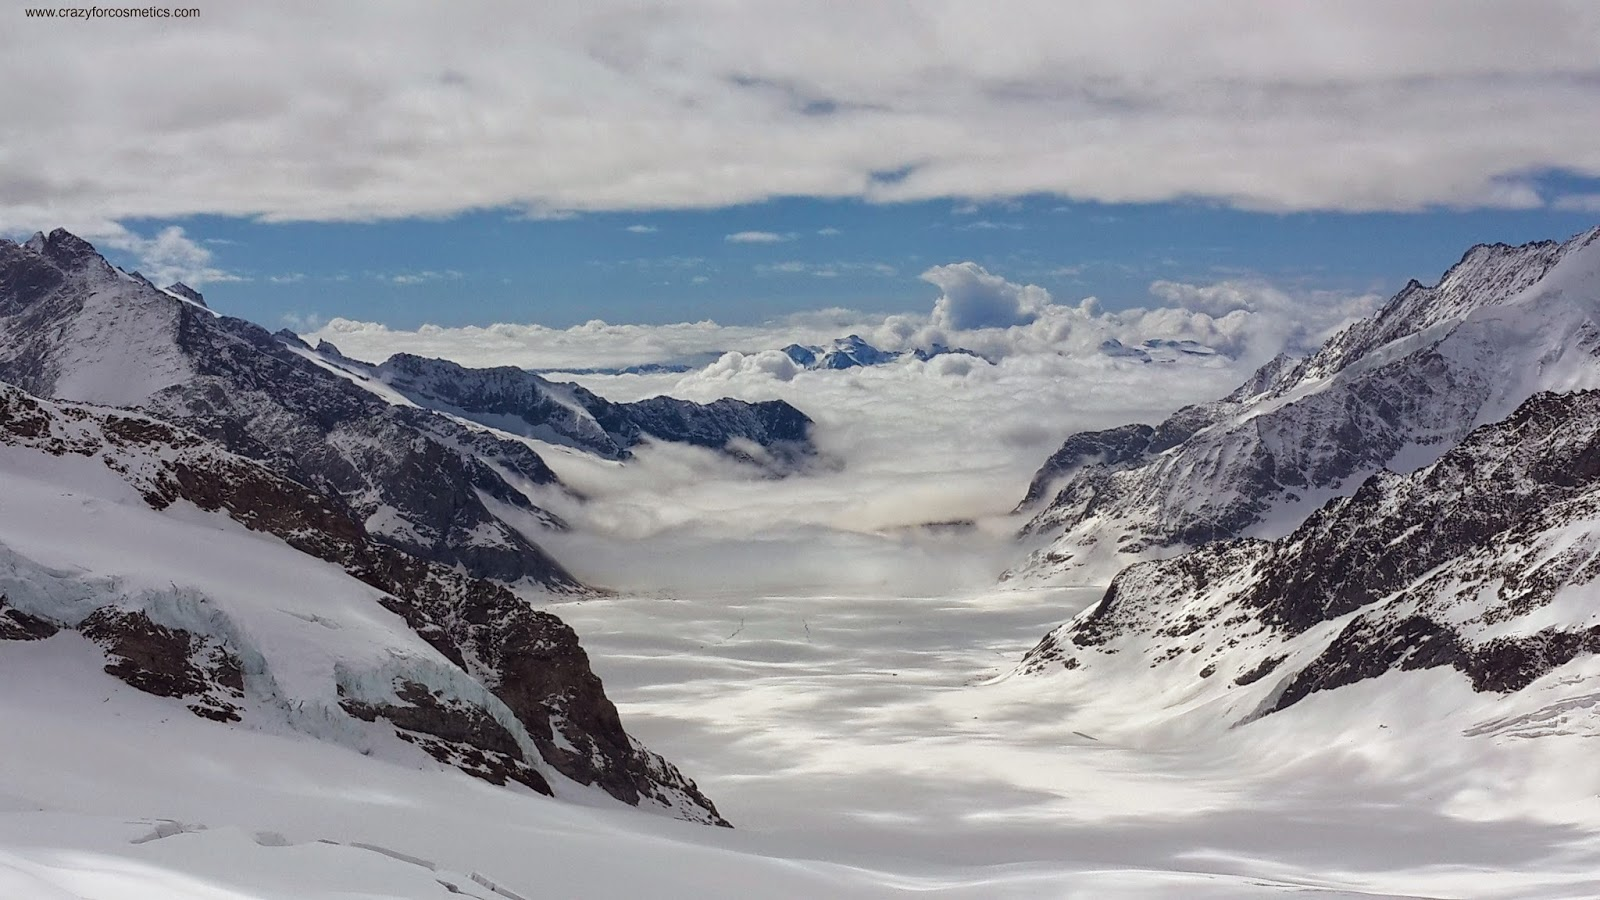 Europe Trip-Trip to Europe tips-Switzerland & Paris trip tips- Blog about Paris & switzerland- Zurich-Luzern-Mt.Titlis-Jungfrau Trip-Mt.Rigi-Lake Brienz Cruise-Switzerland lake cruise